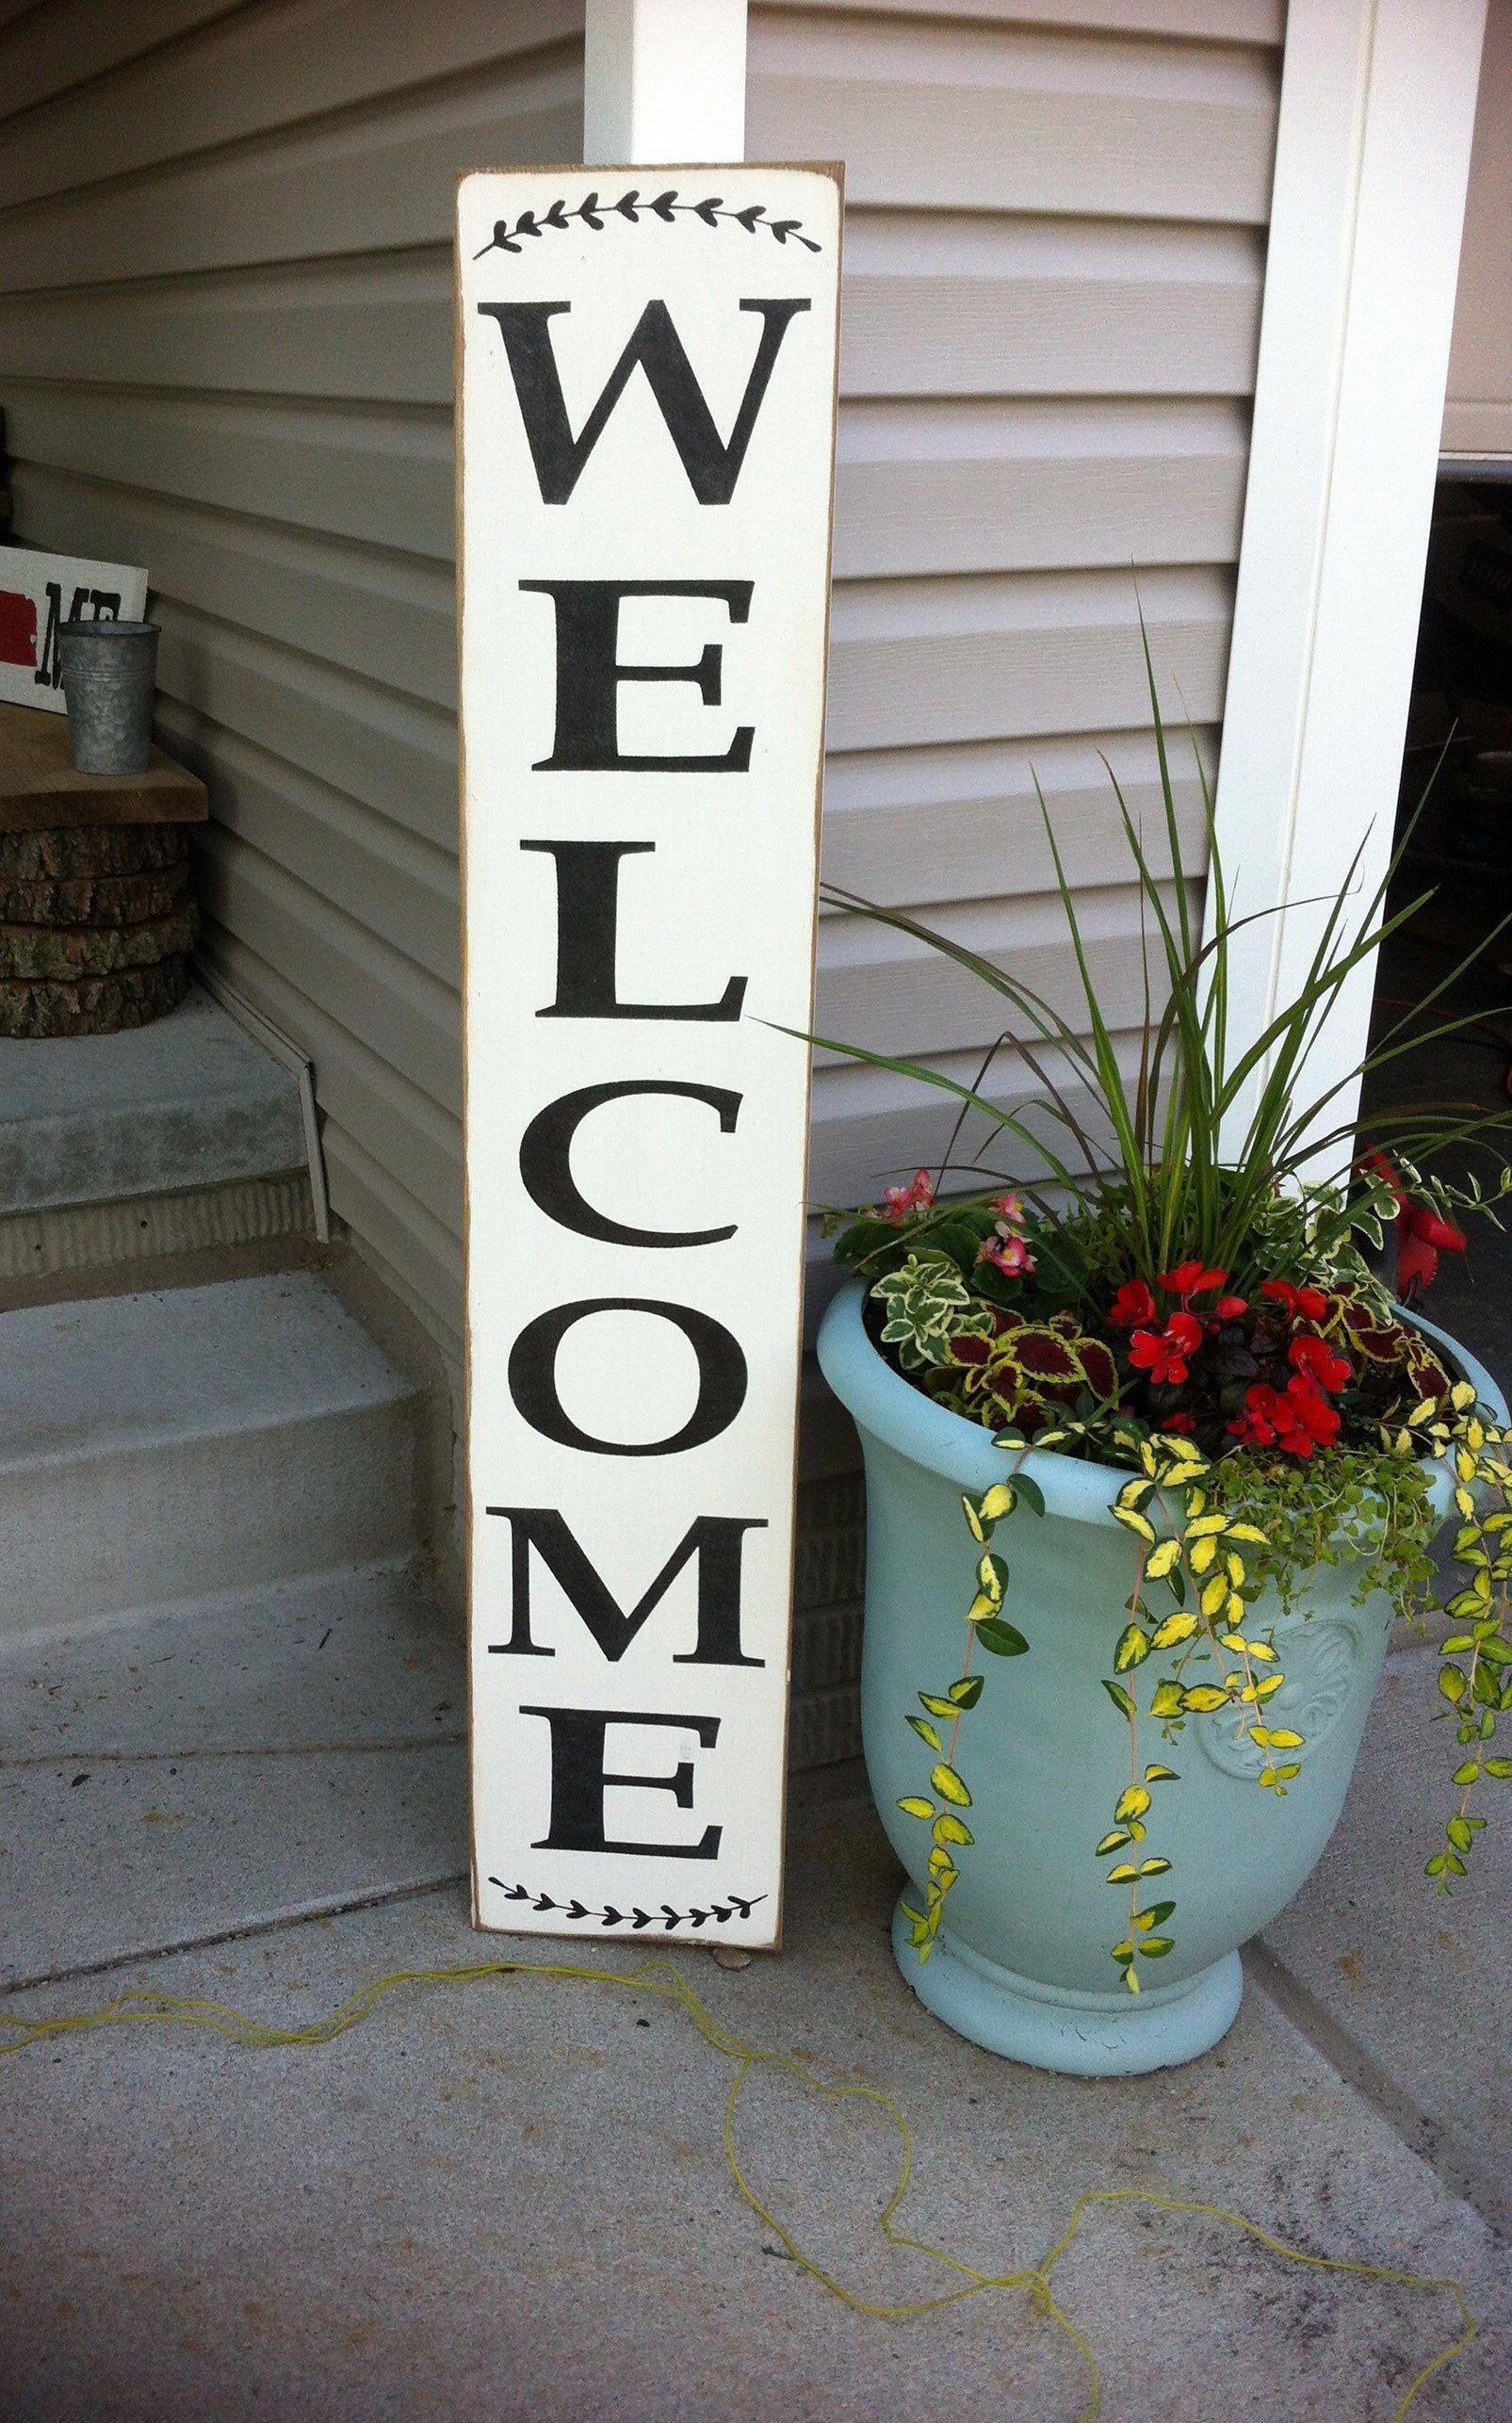 primitive technology homes #Primitivehomes | Porch welcome ...